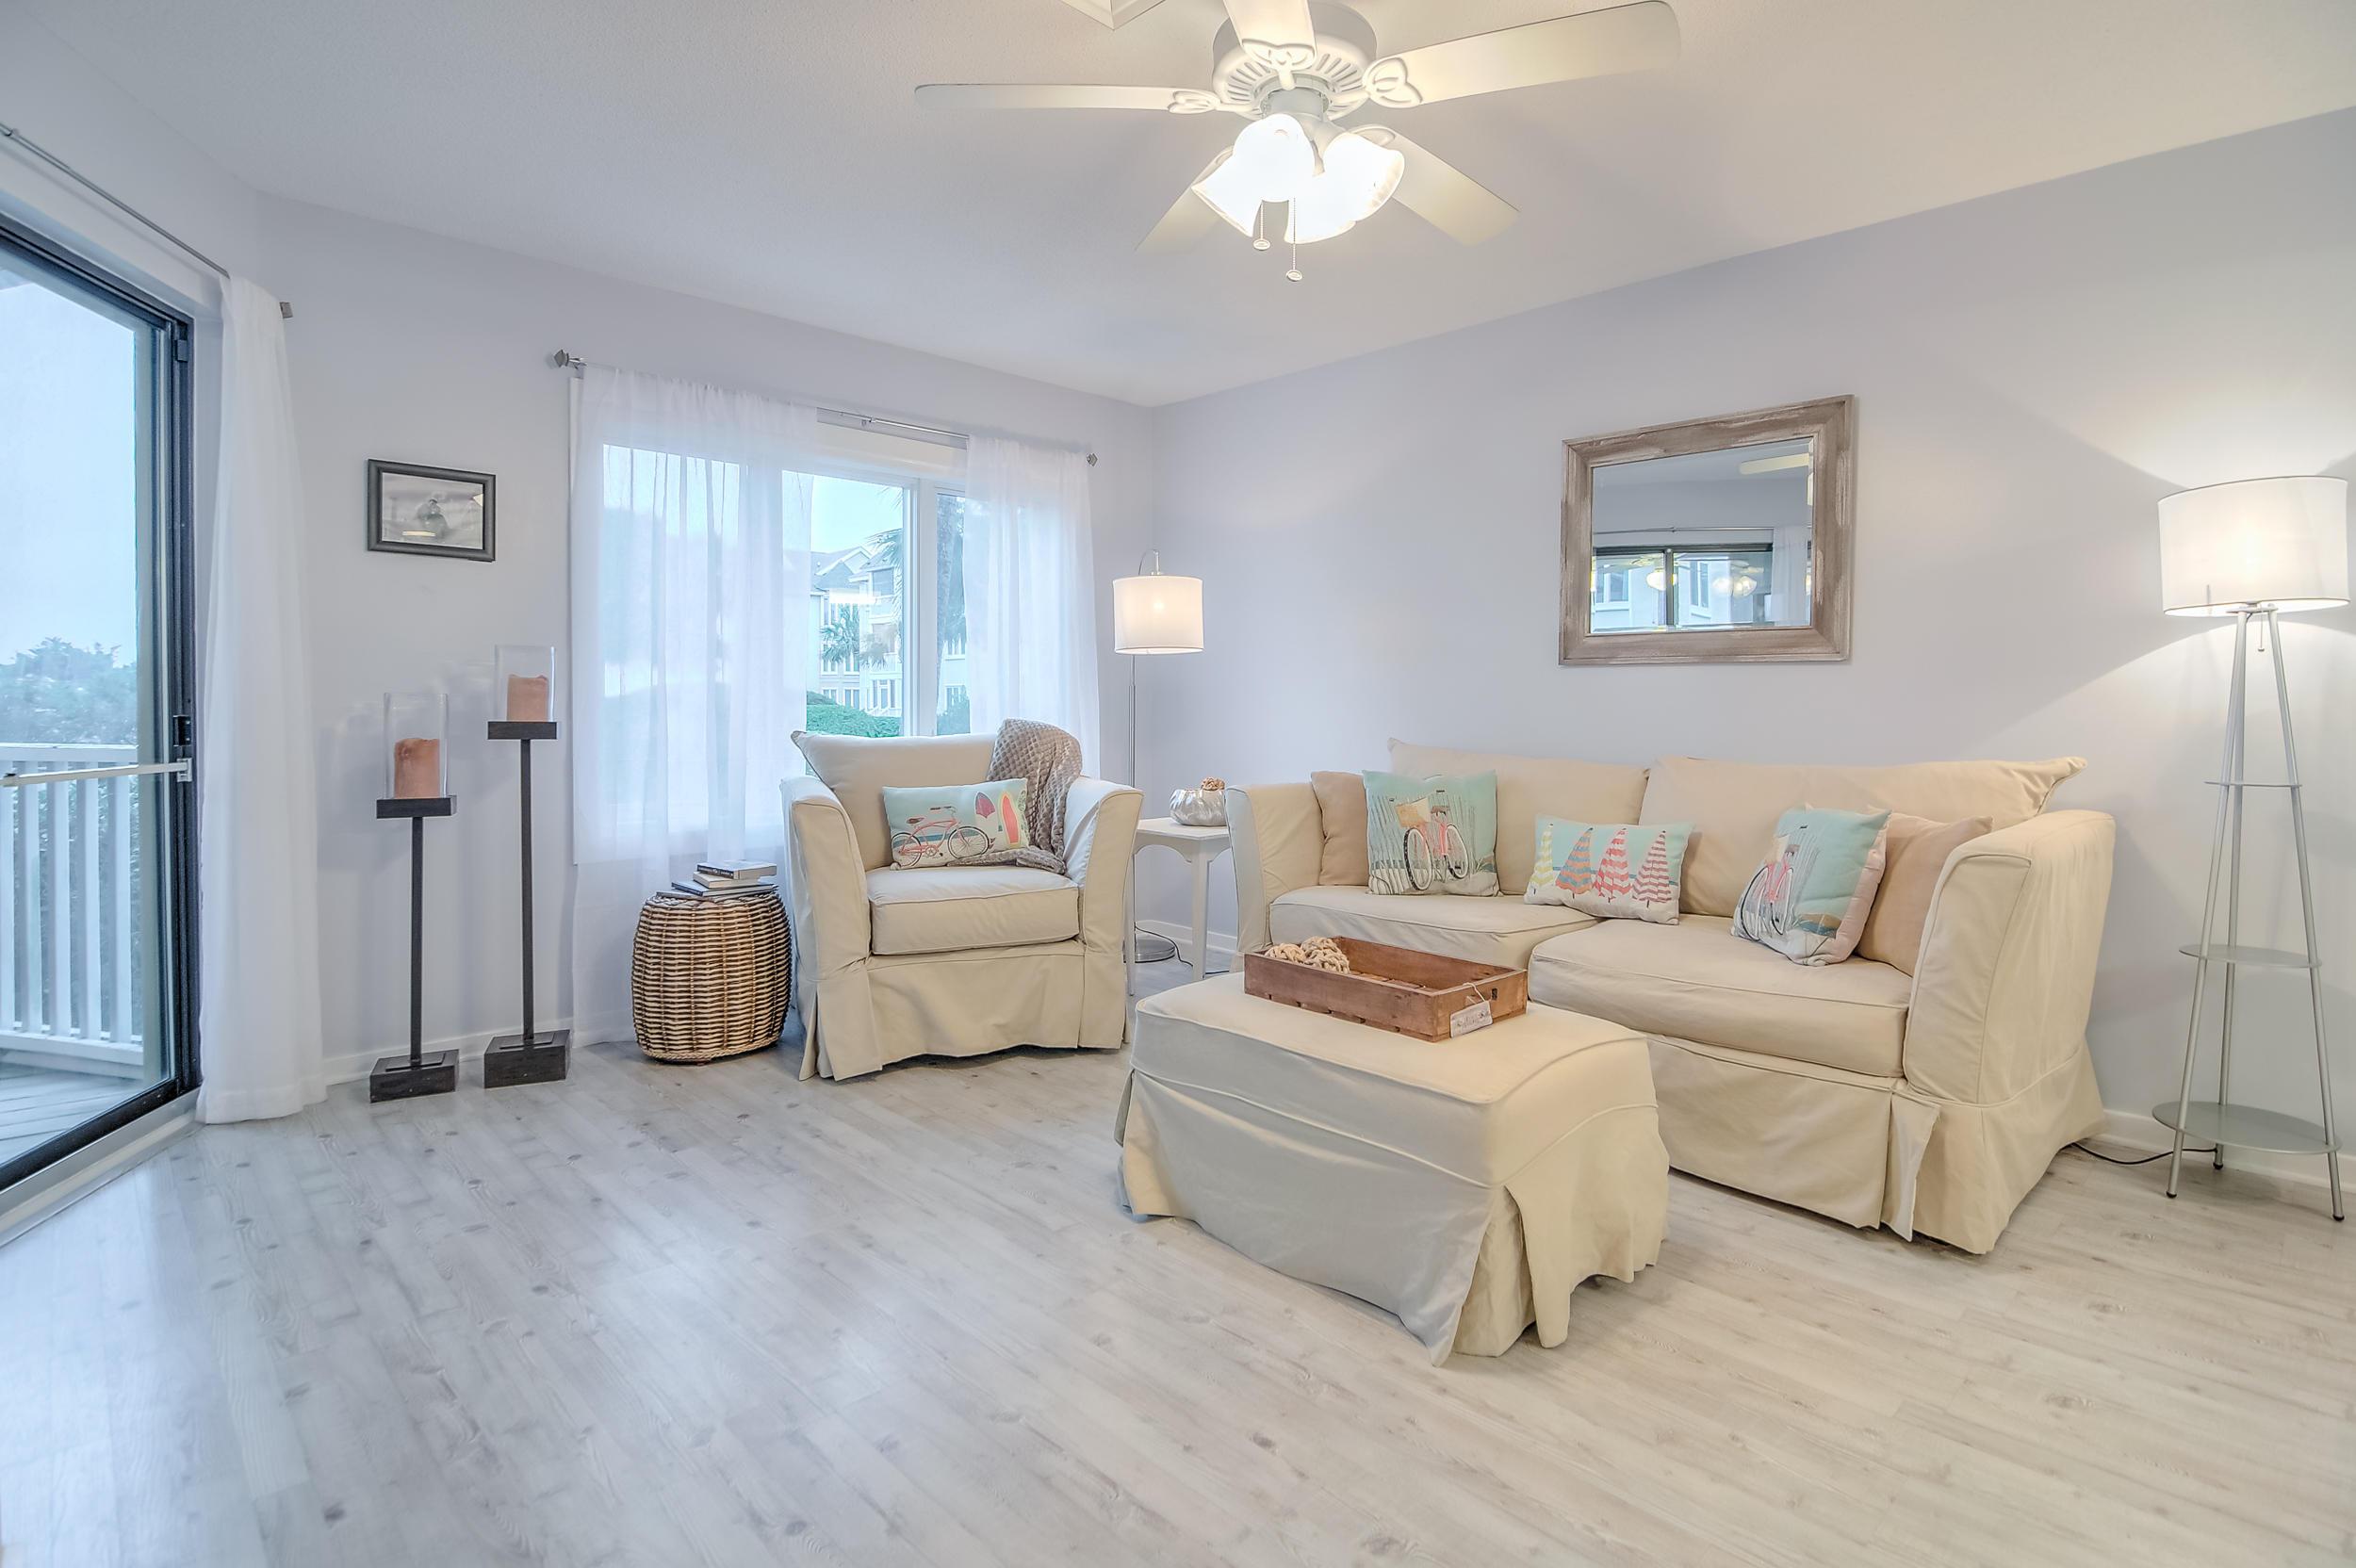 Port Ocall Homes For Sale - 103 Port O Call, Isle of Palms, SC - 8